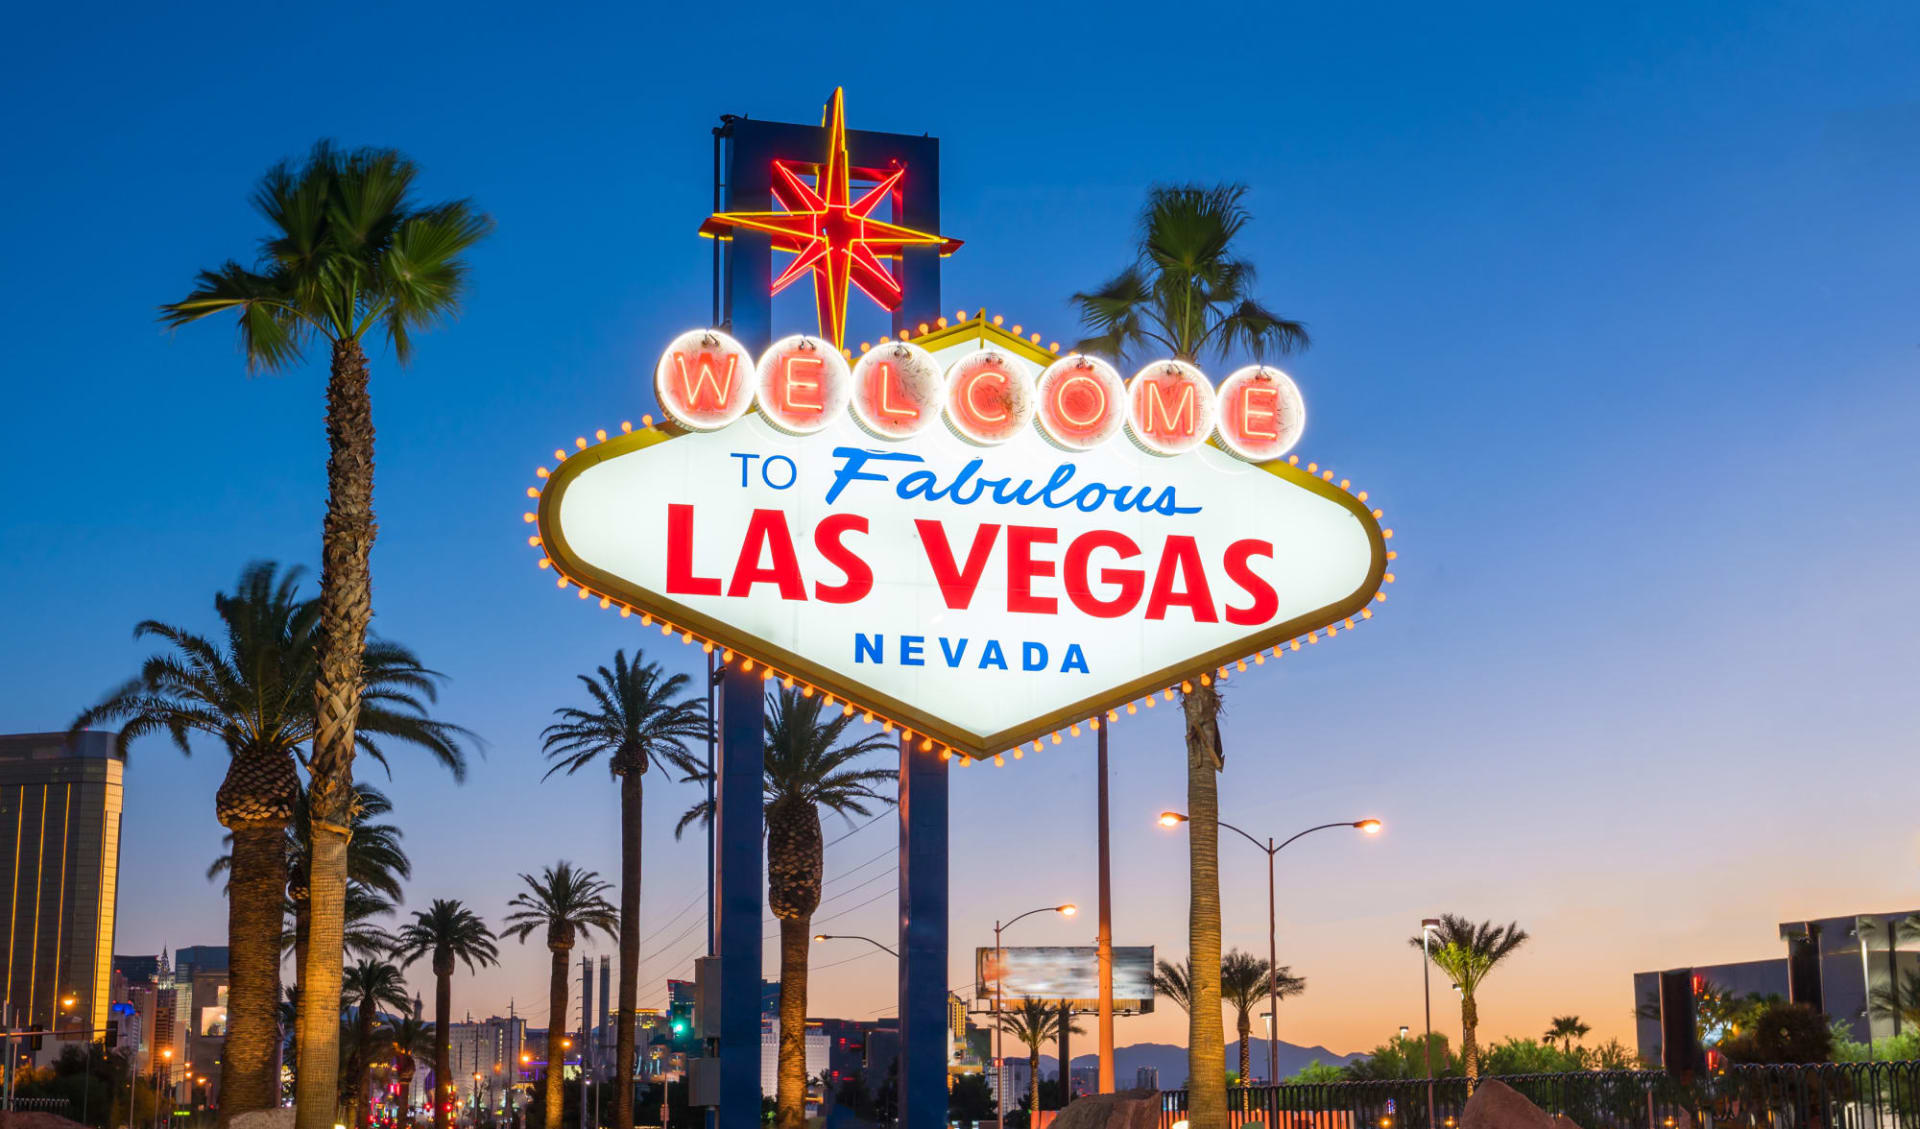 Nationalparks Explorer ab Las Vegas: USA - Nevada - Welcome to Las Vegas Schild